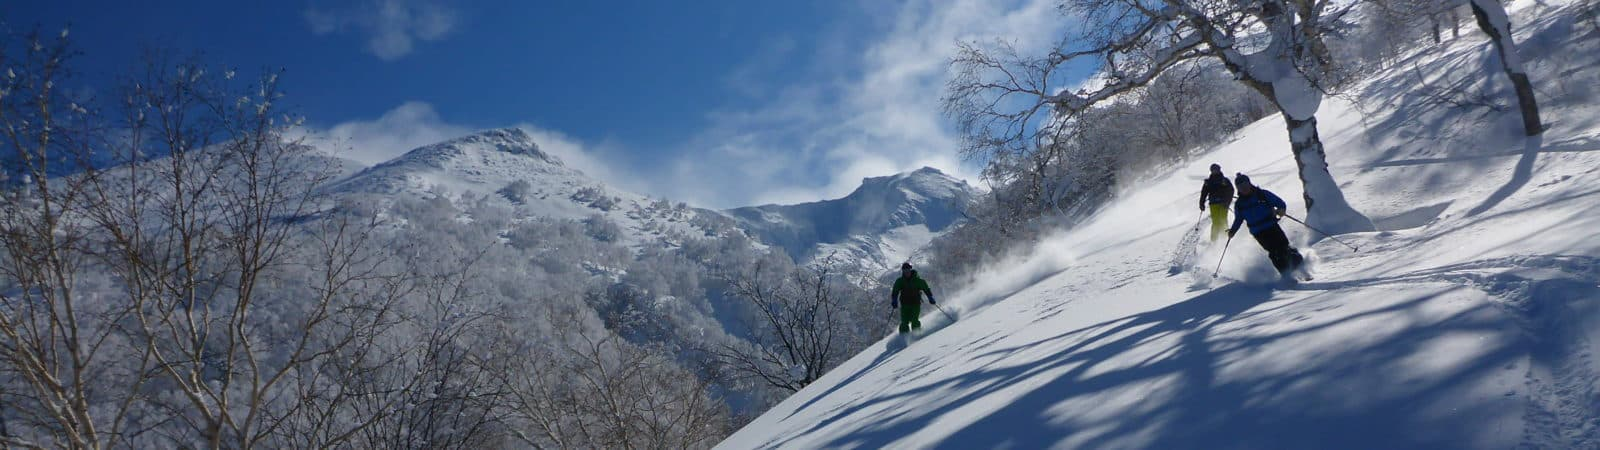 Ski touring in Asahikawa in Hokkaido